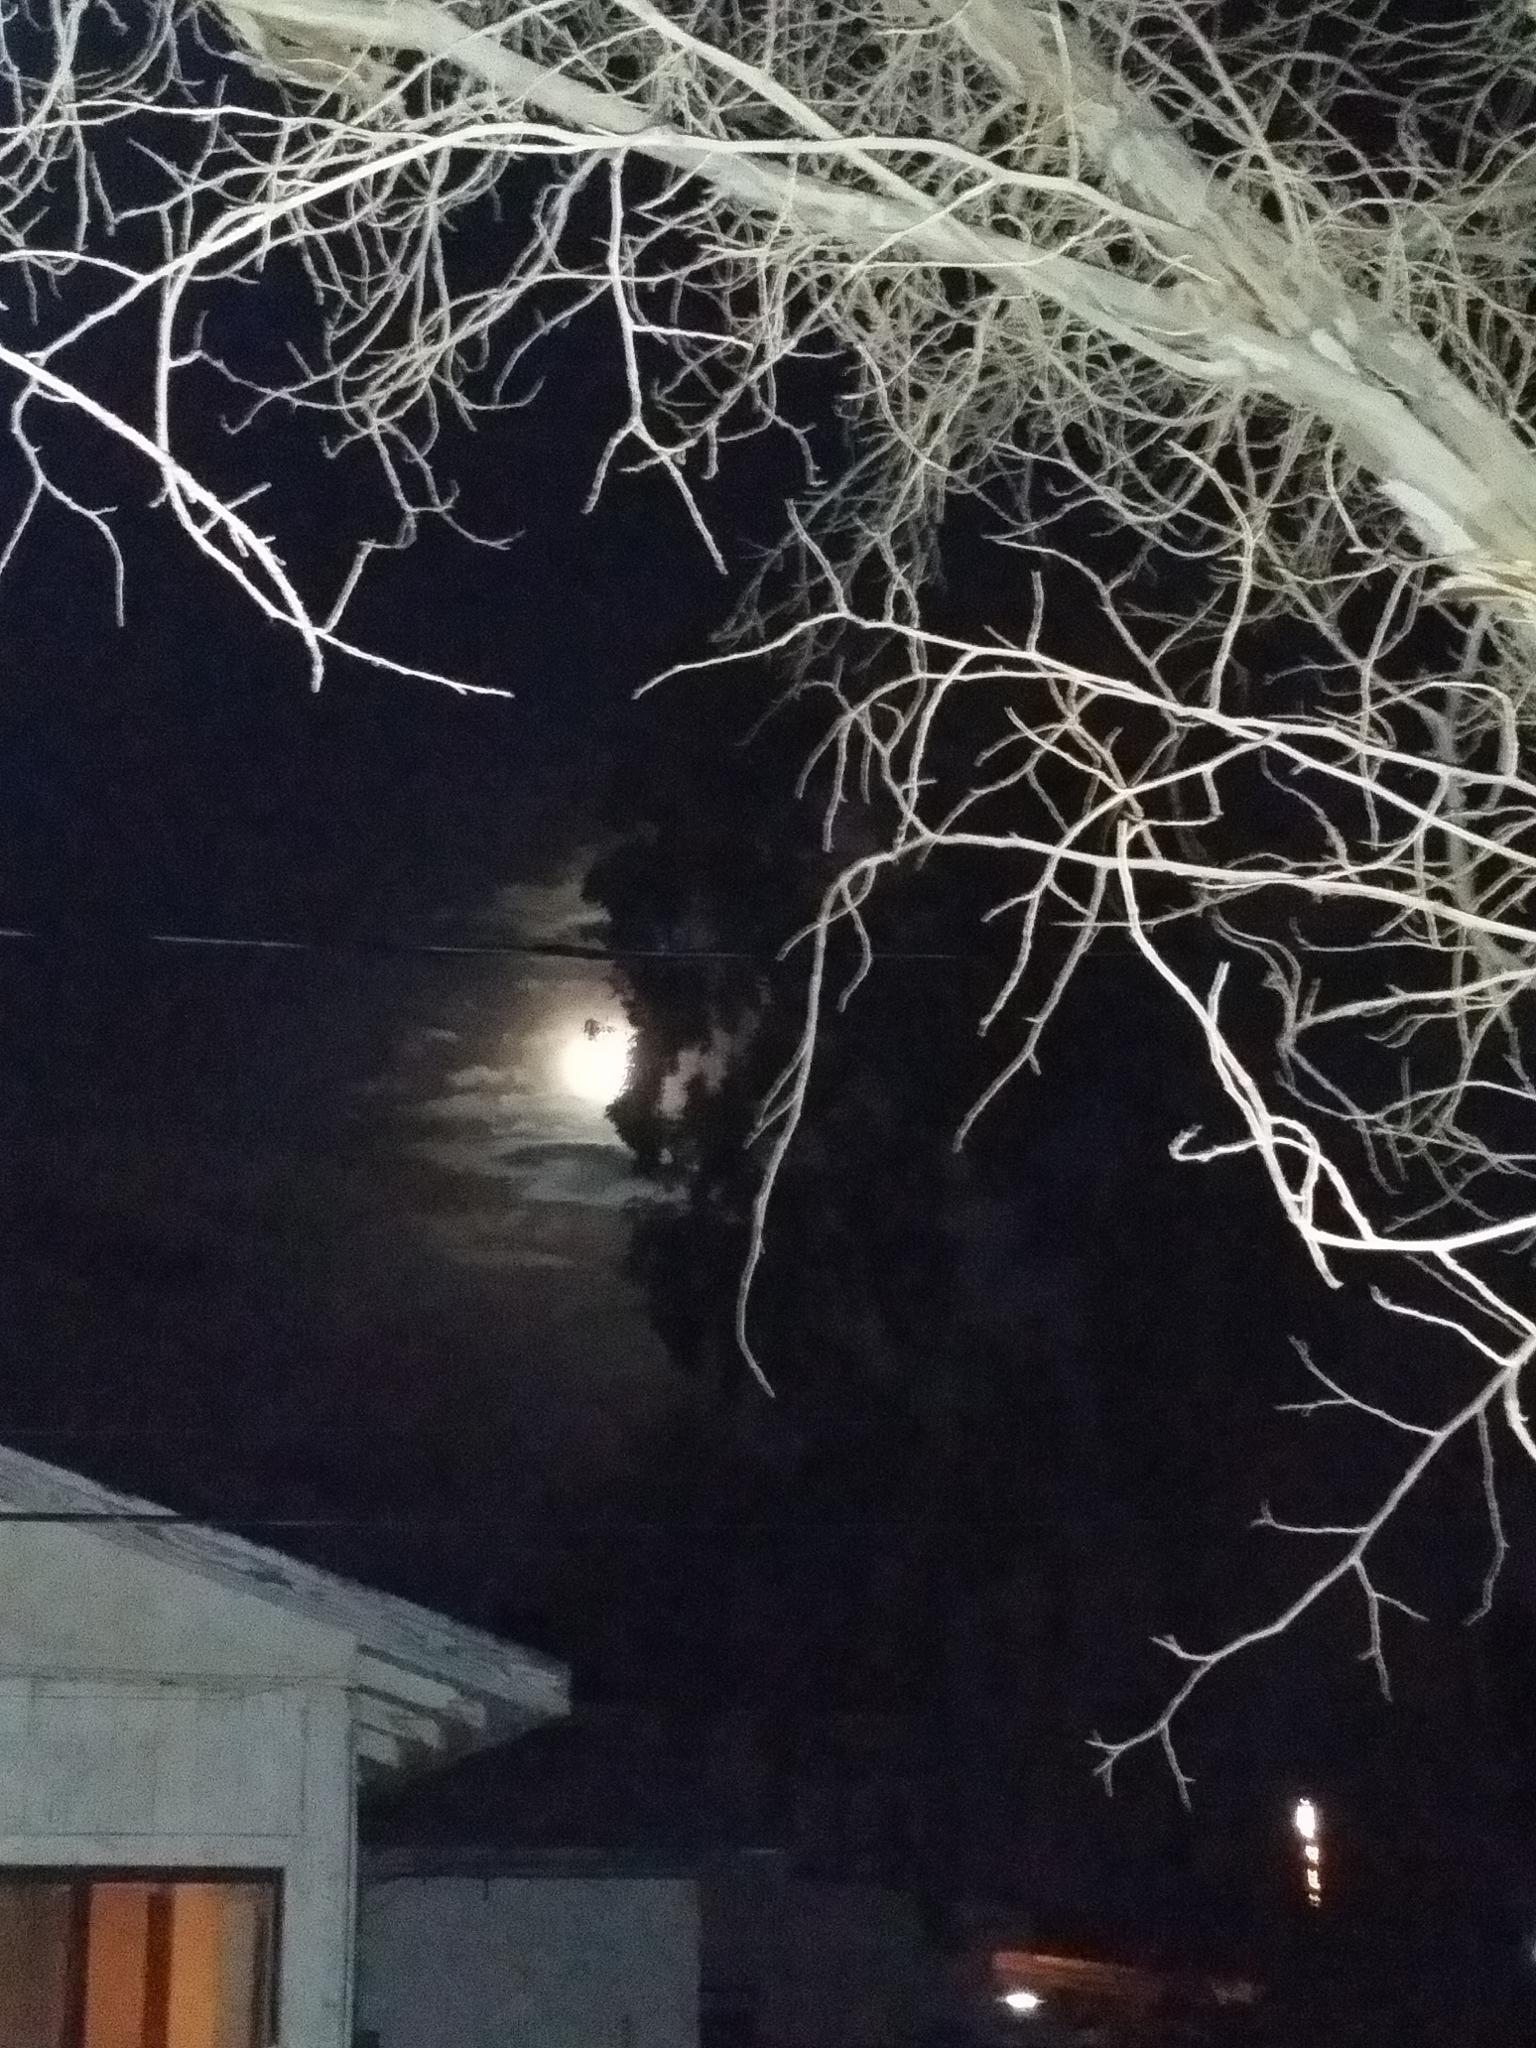 wicked  moon  by pattie.mcwhorter